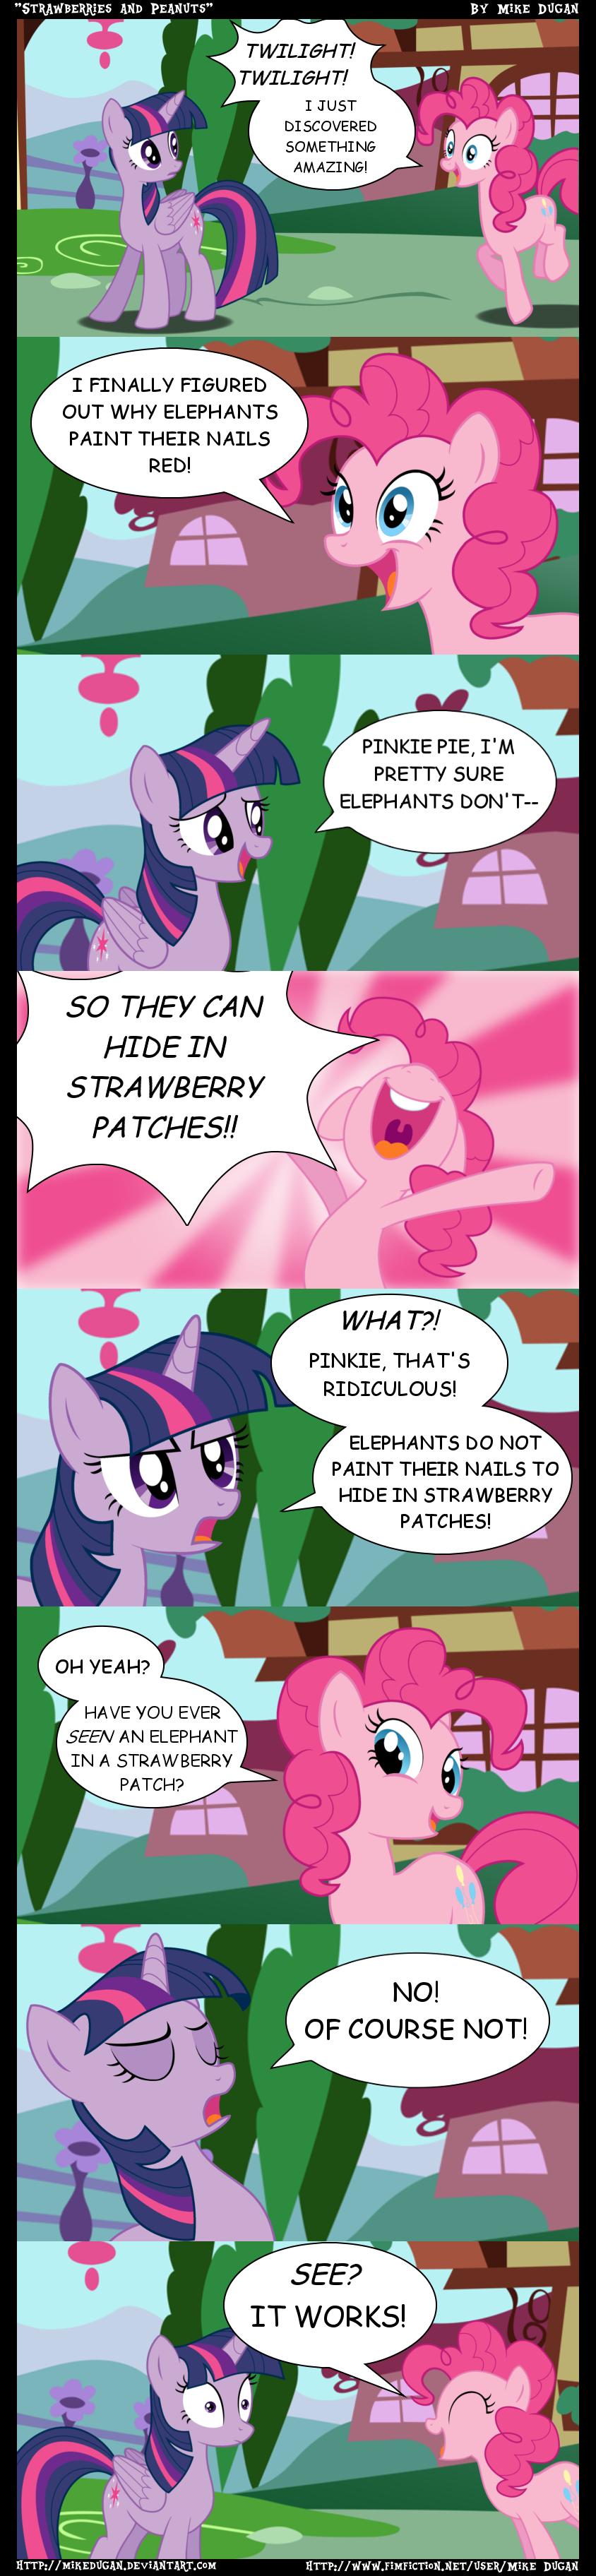 MLP Comic - Strawberries and Peanuts